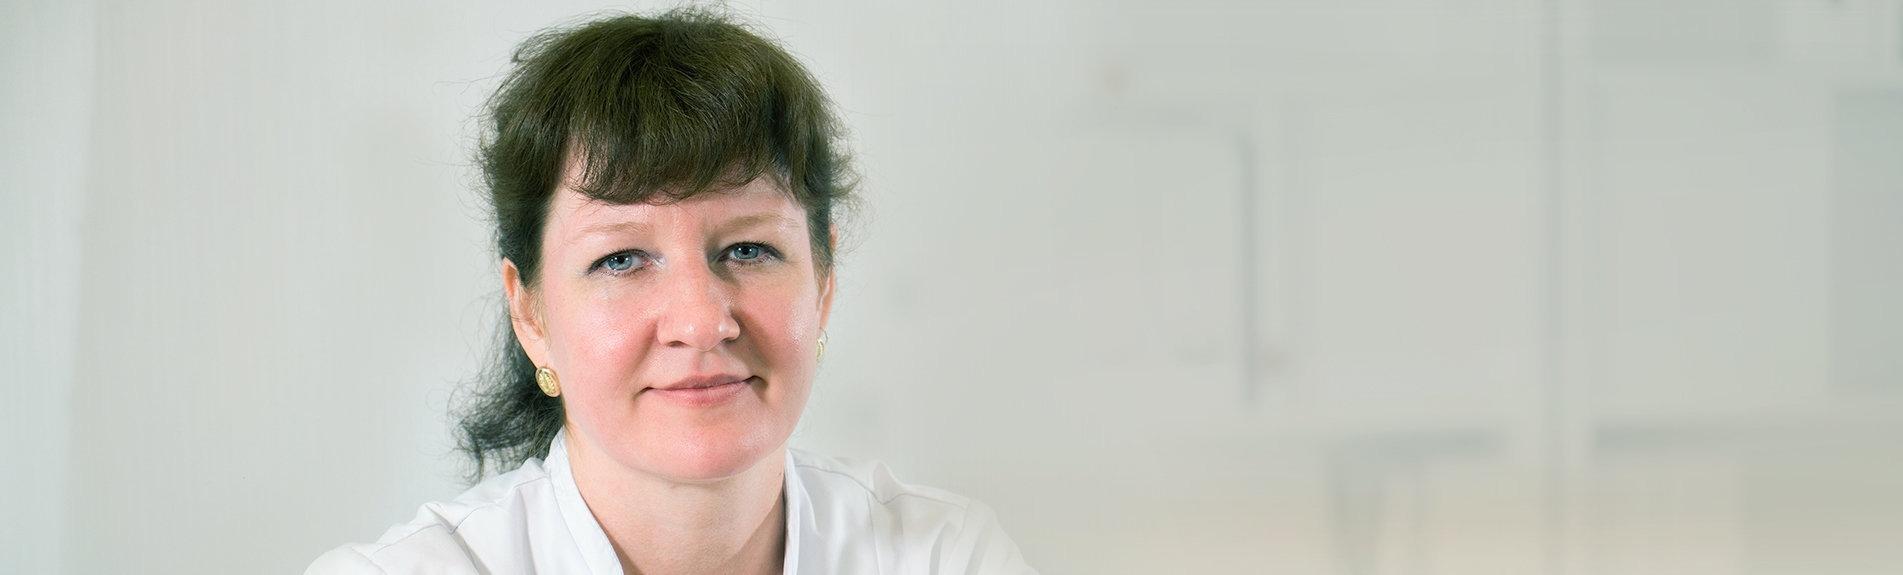 Бондаренко Татьяна Алексеевна — фото №1